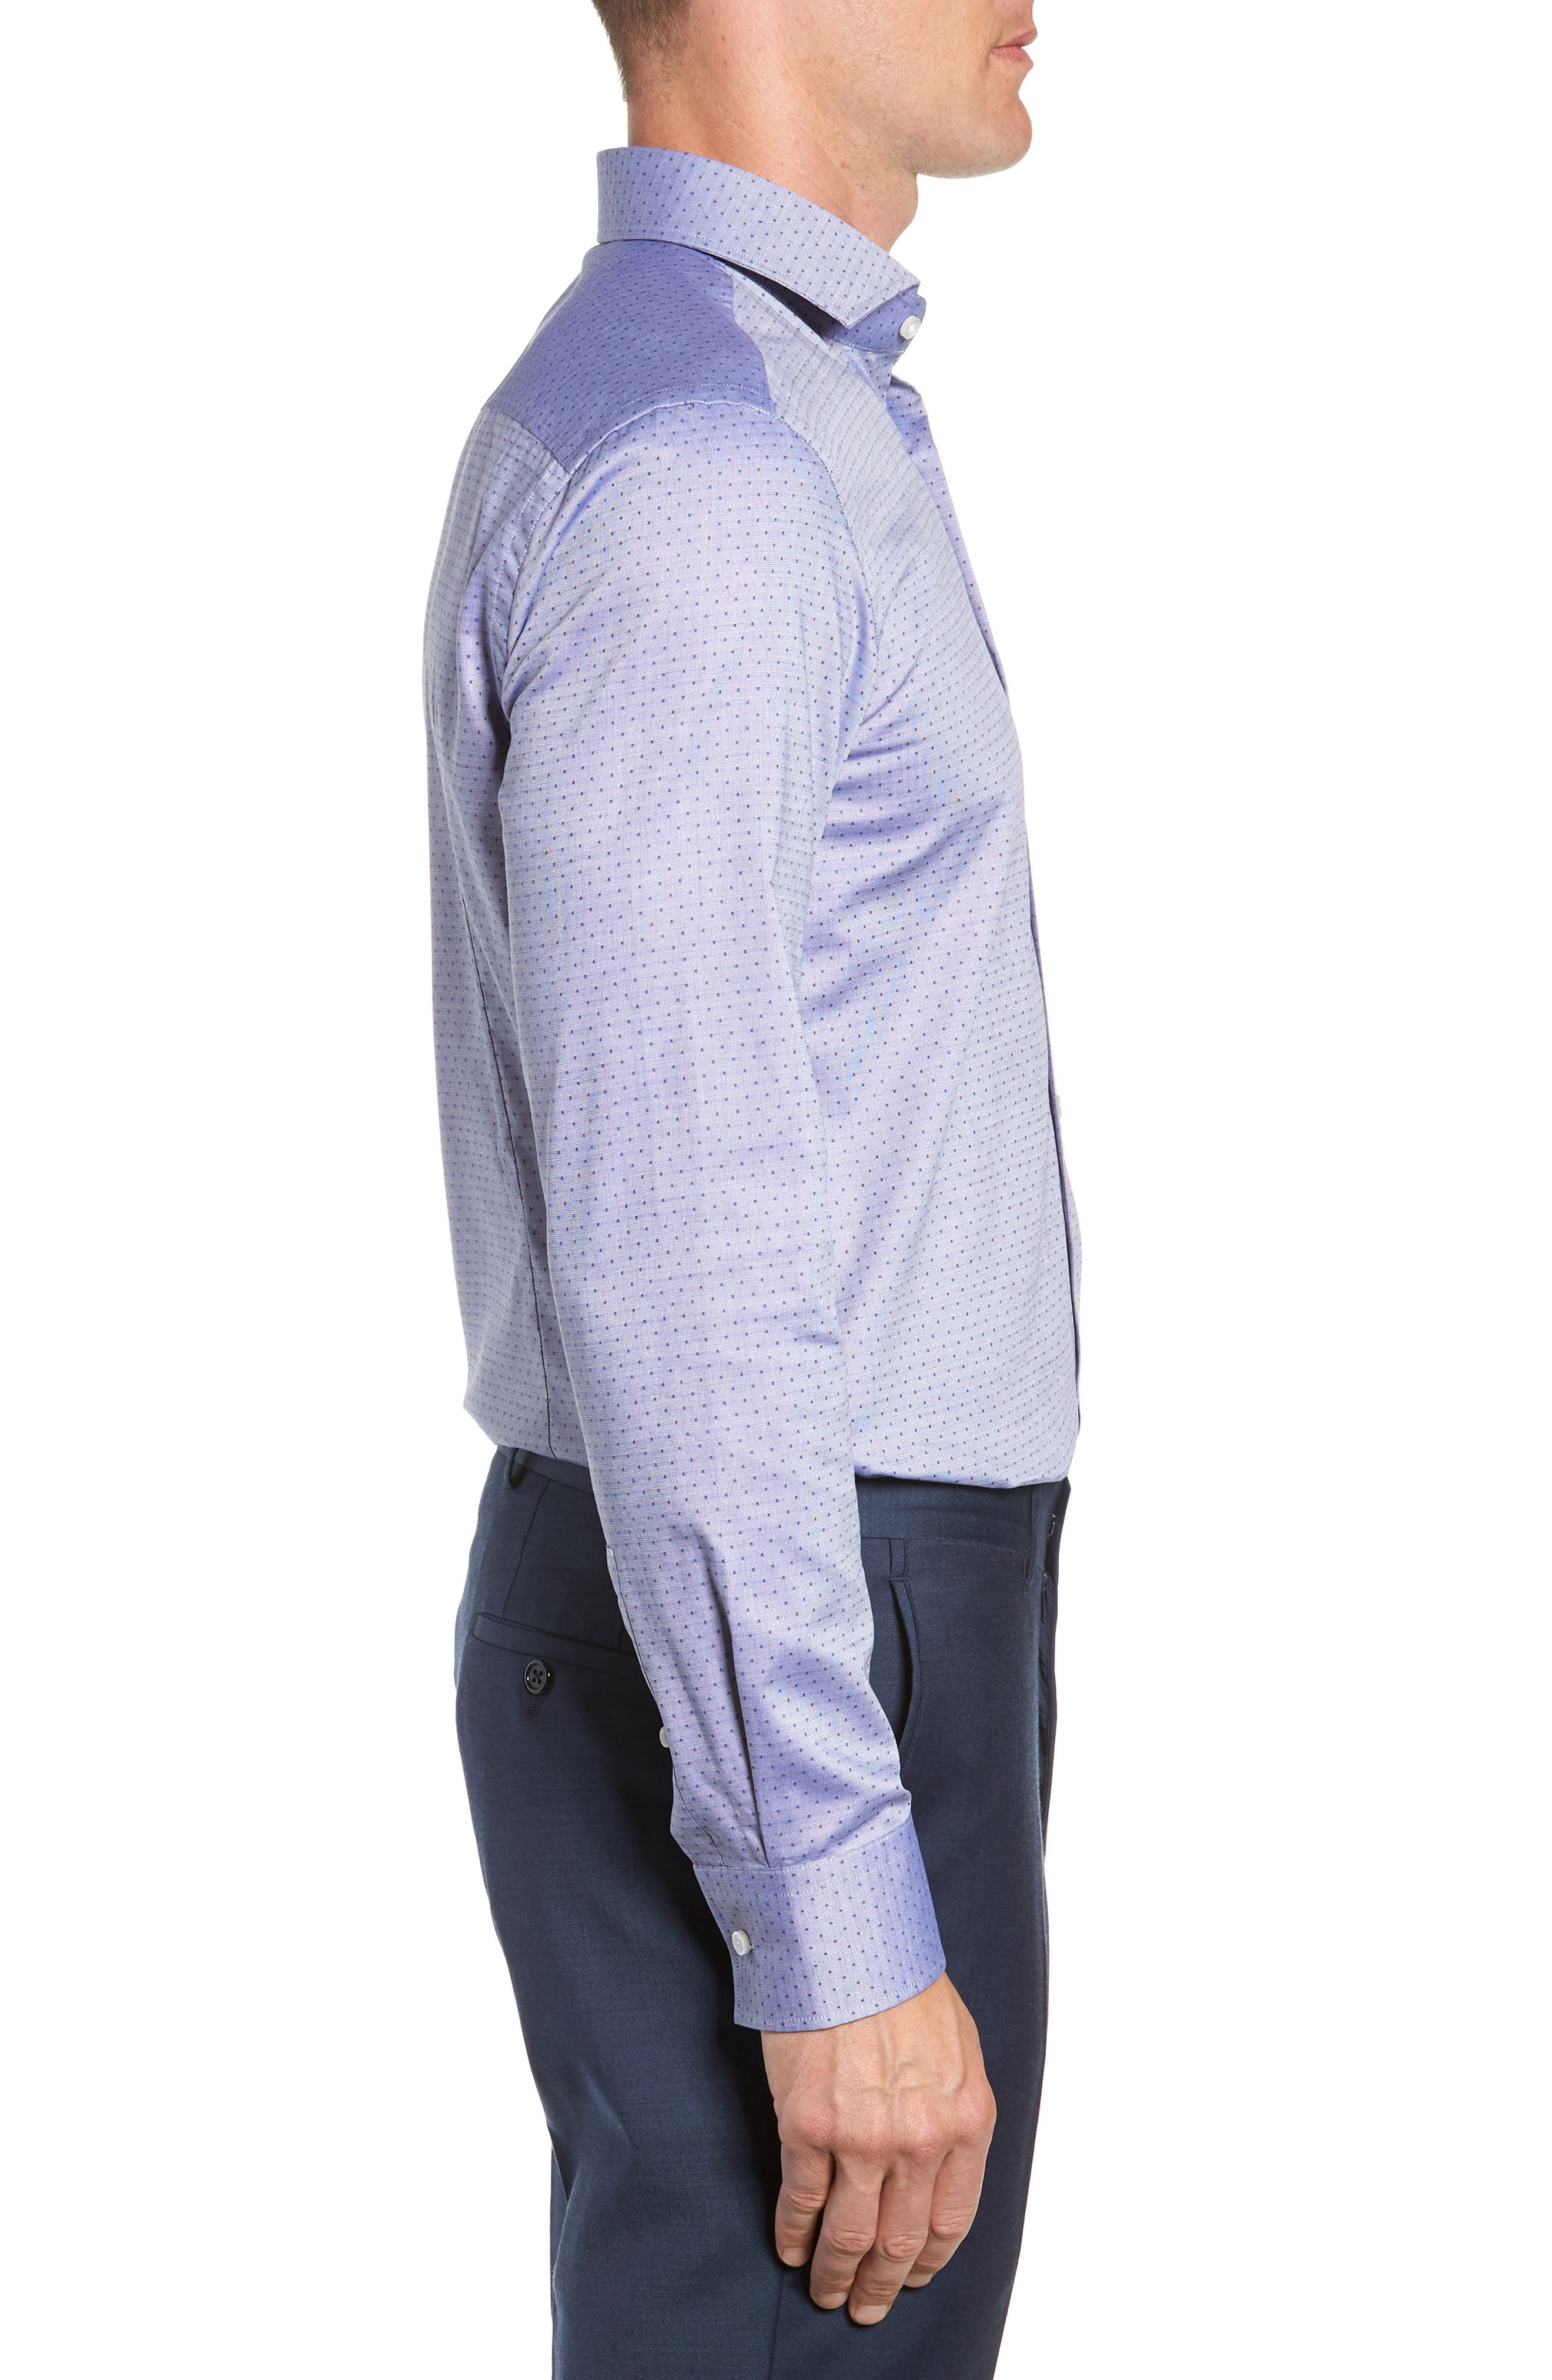 Jason Slim Fit Dot Dress Shirt,                             Alternate thumbnail 4, color,                             NAVY